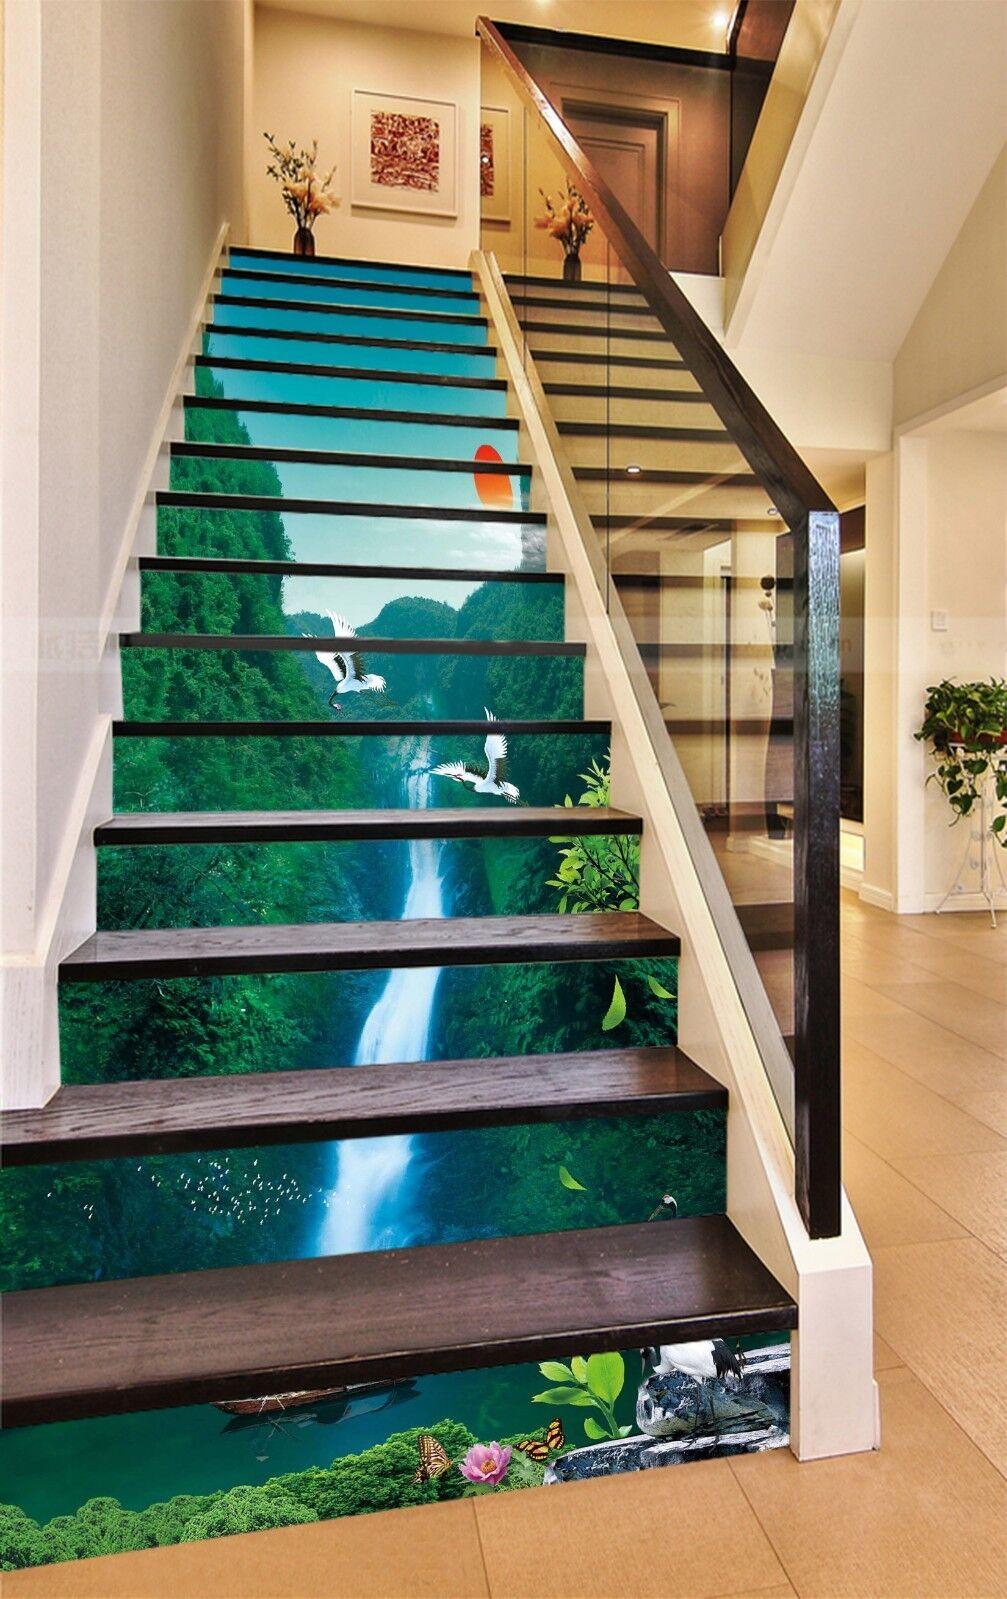 3D Waterfall Sun Stair Risers Decoration Photo Mural Vinyl Decal Wallpaper US